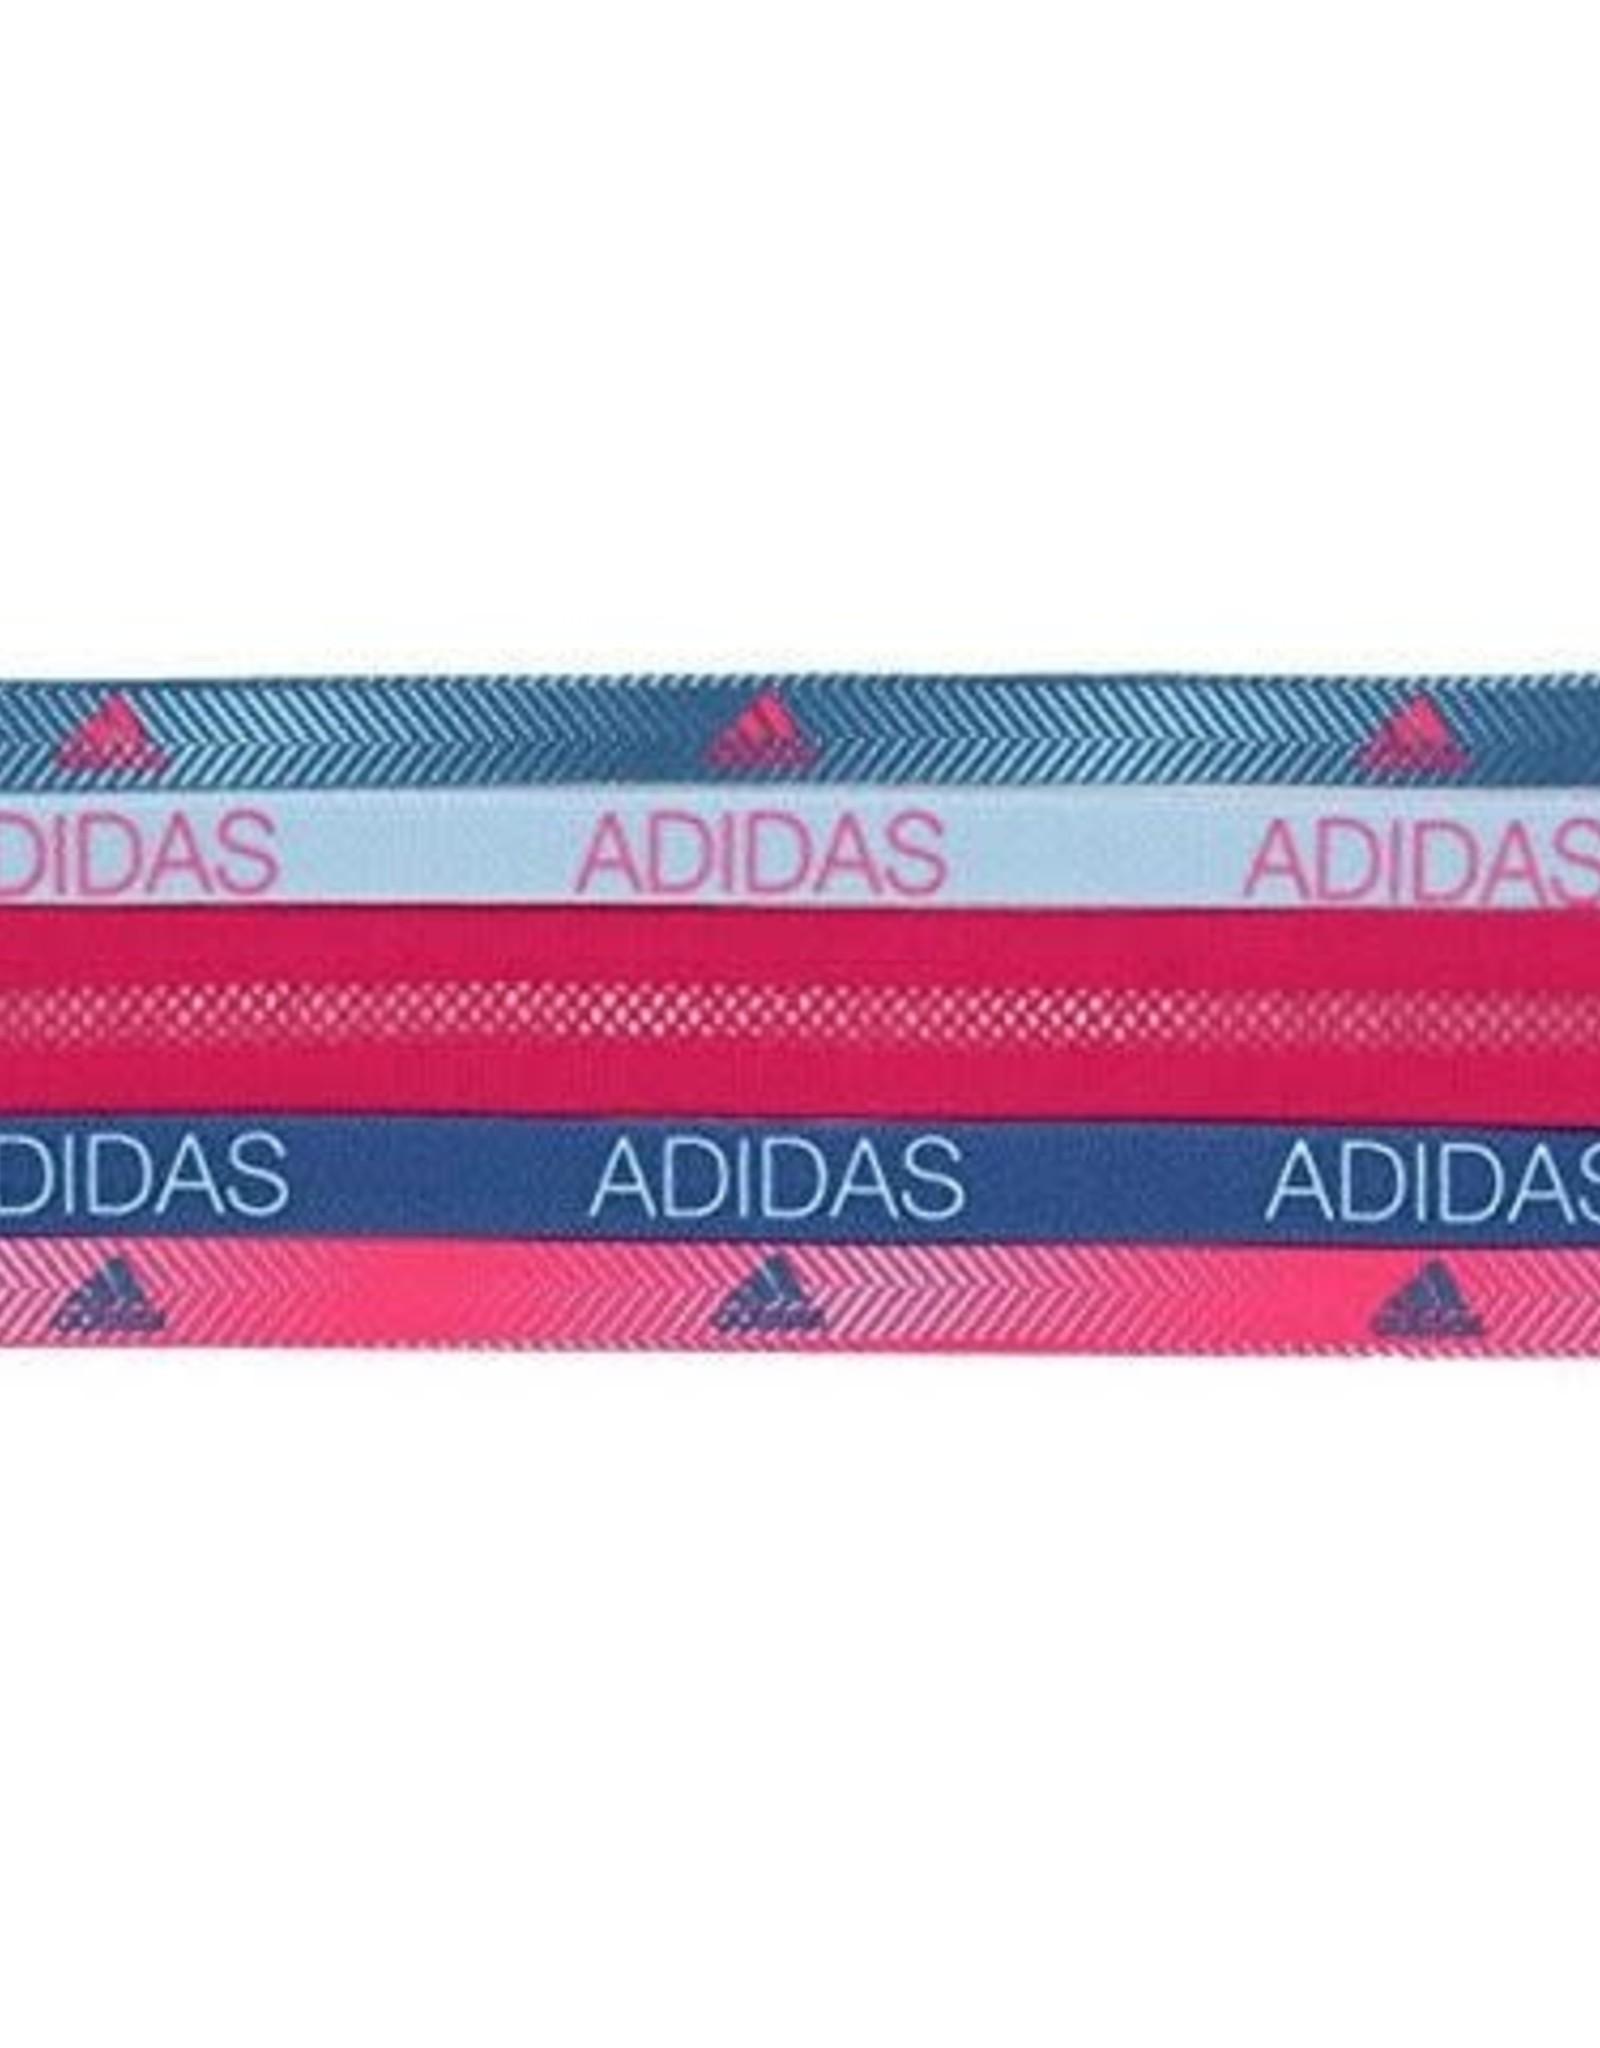 Adidas Adidas Creator Hairbands 5142714